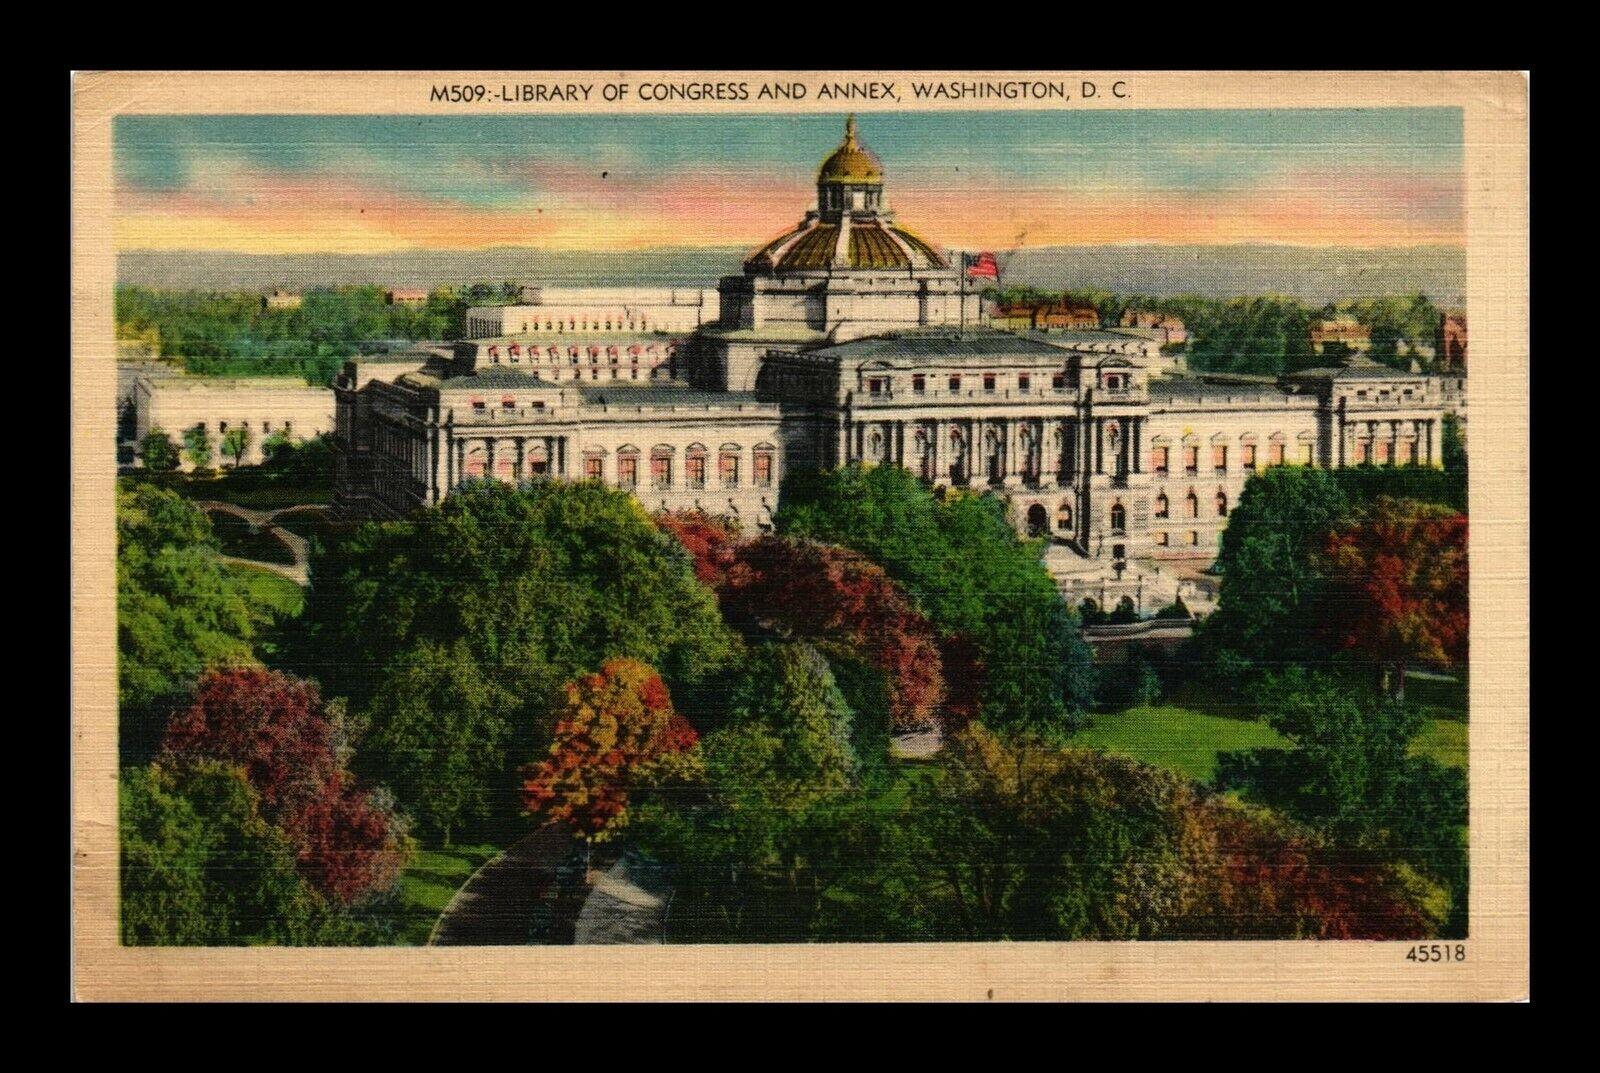 DR JIM STAMPS US LIBRARY OF CONGRESS ANNEX WASHINGTON DC LINEN POSTCARD 1942 - $0.25